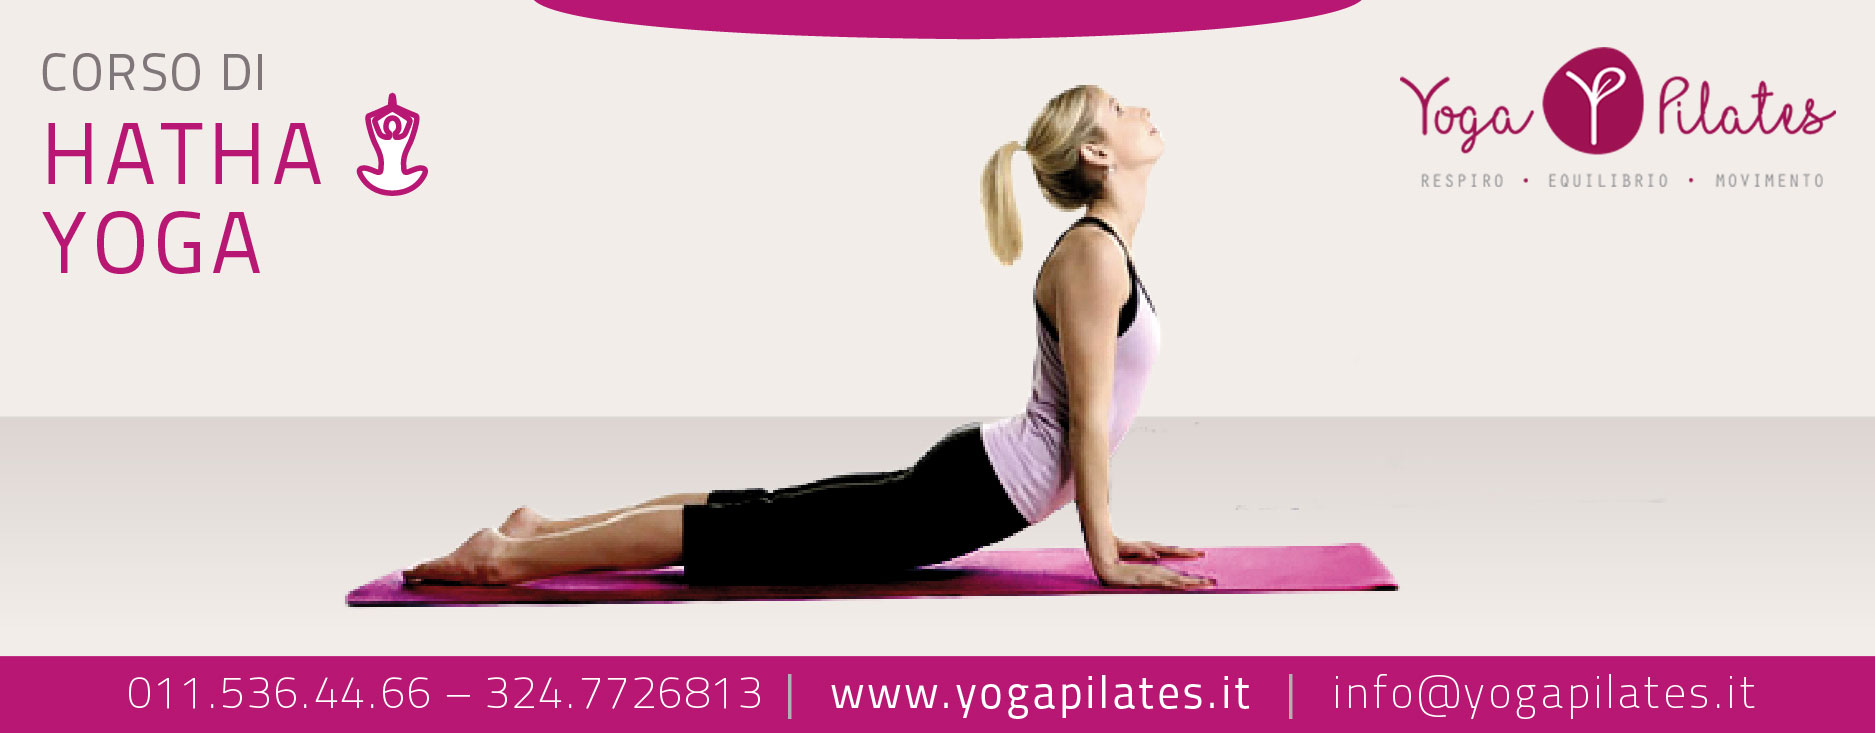 Yoga Pilates Ppm Torino Le 4 Sedi Lagrange Tassoni Santa Rita Crocetta Yoga Torino